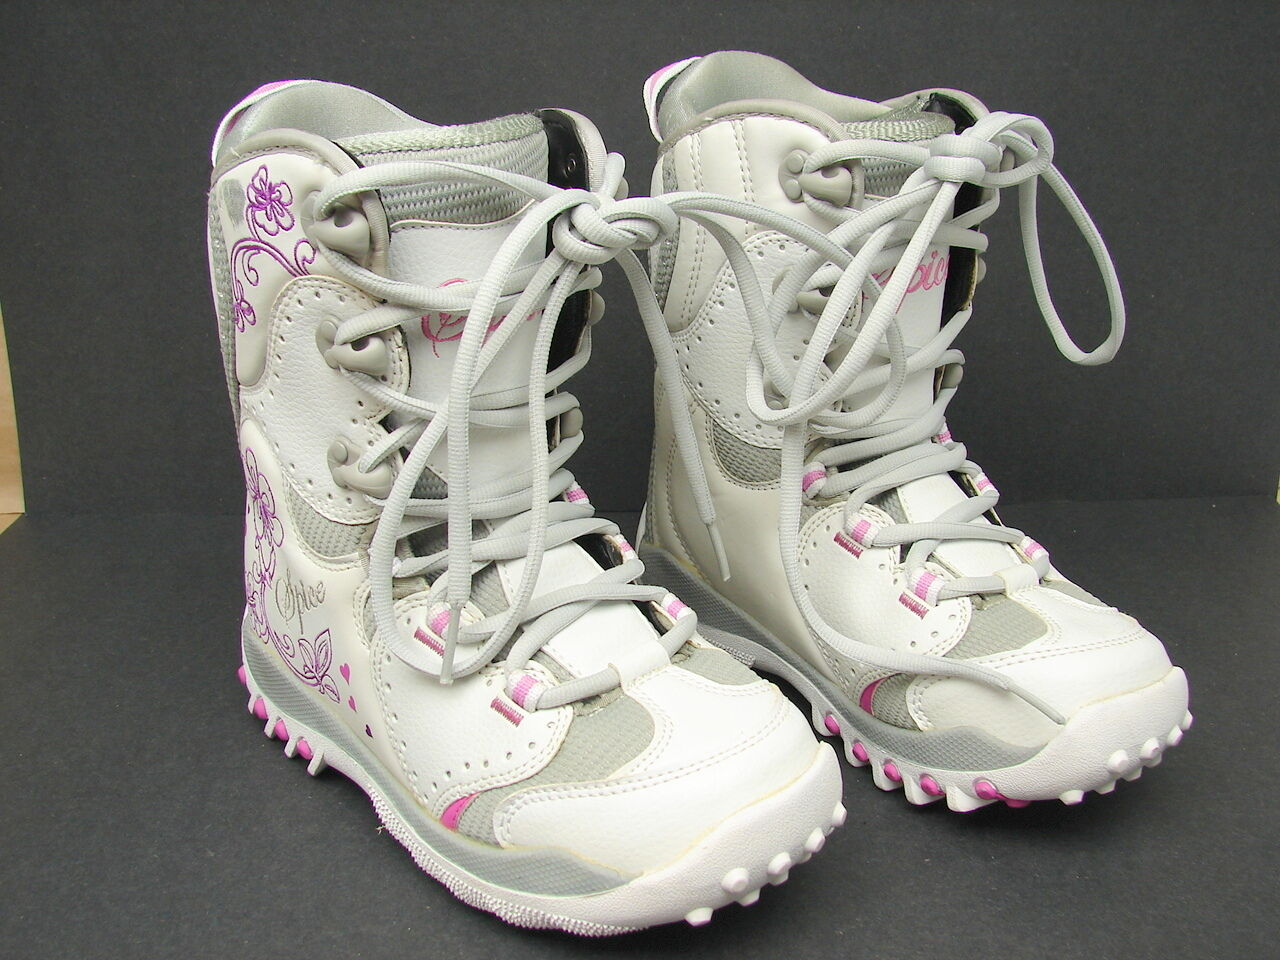 New NOS Girls Spice Snowboard Boots US 5 Mondo 23.0